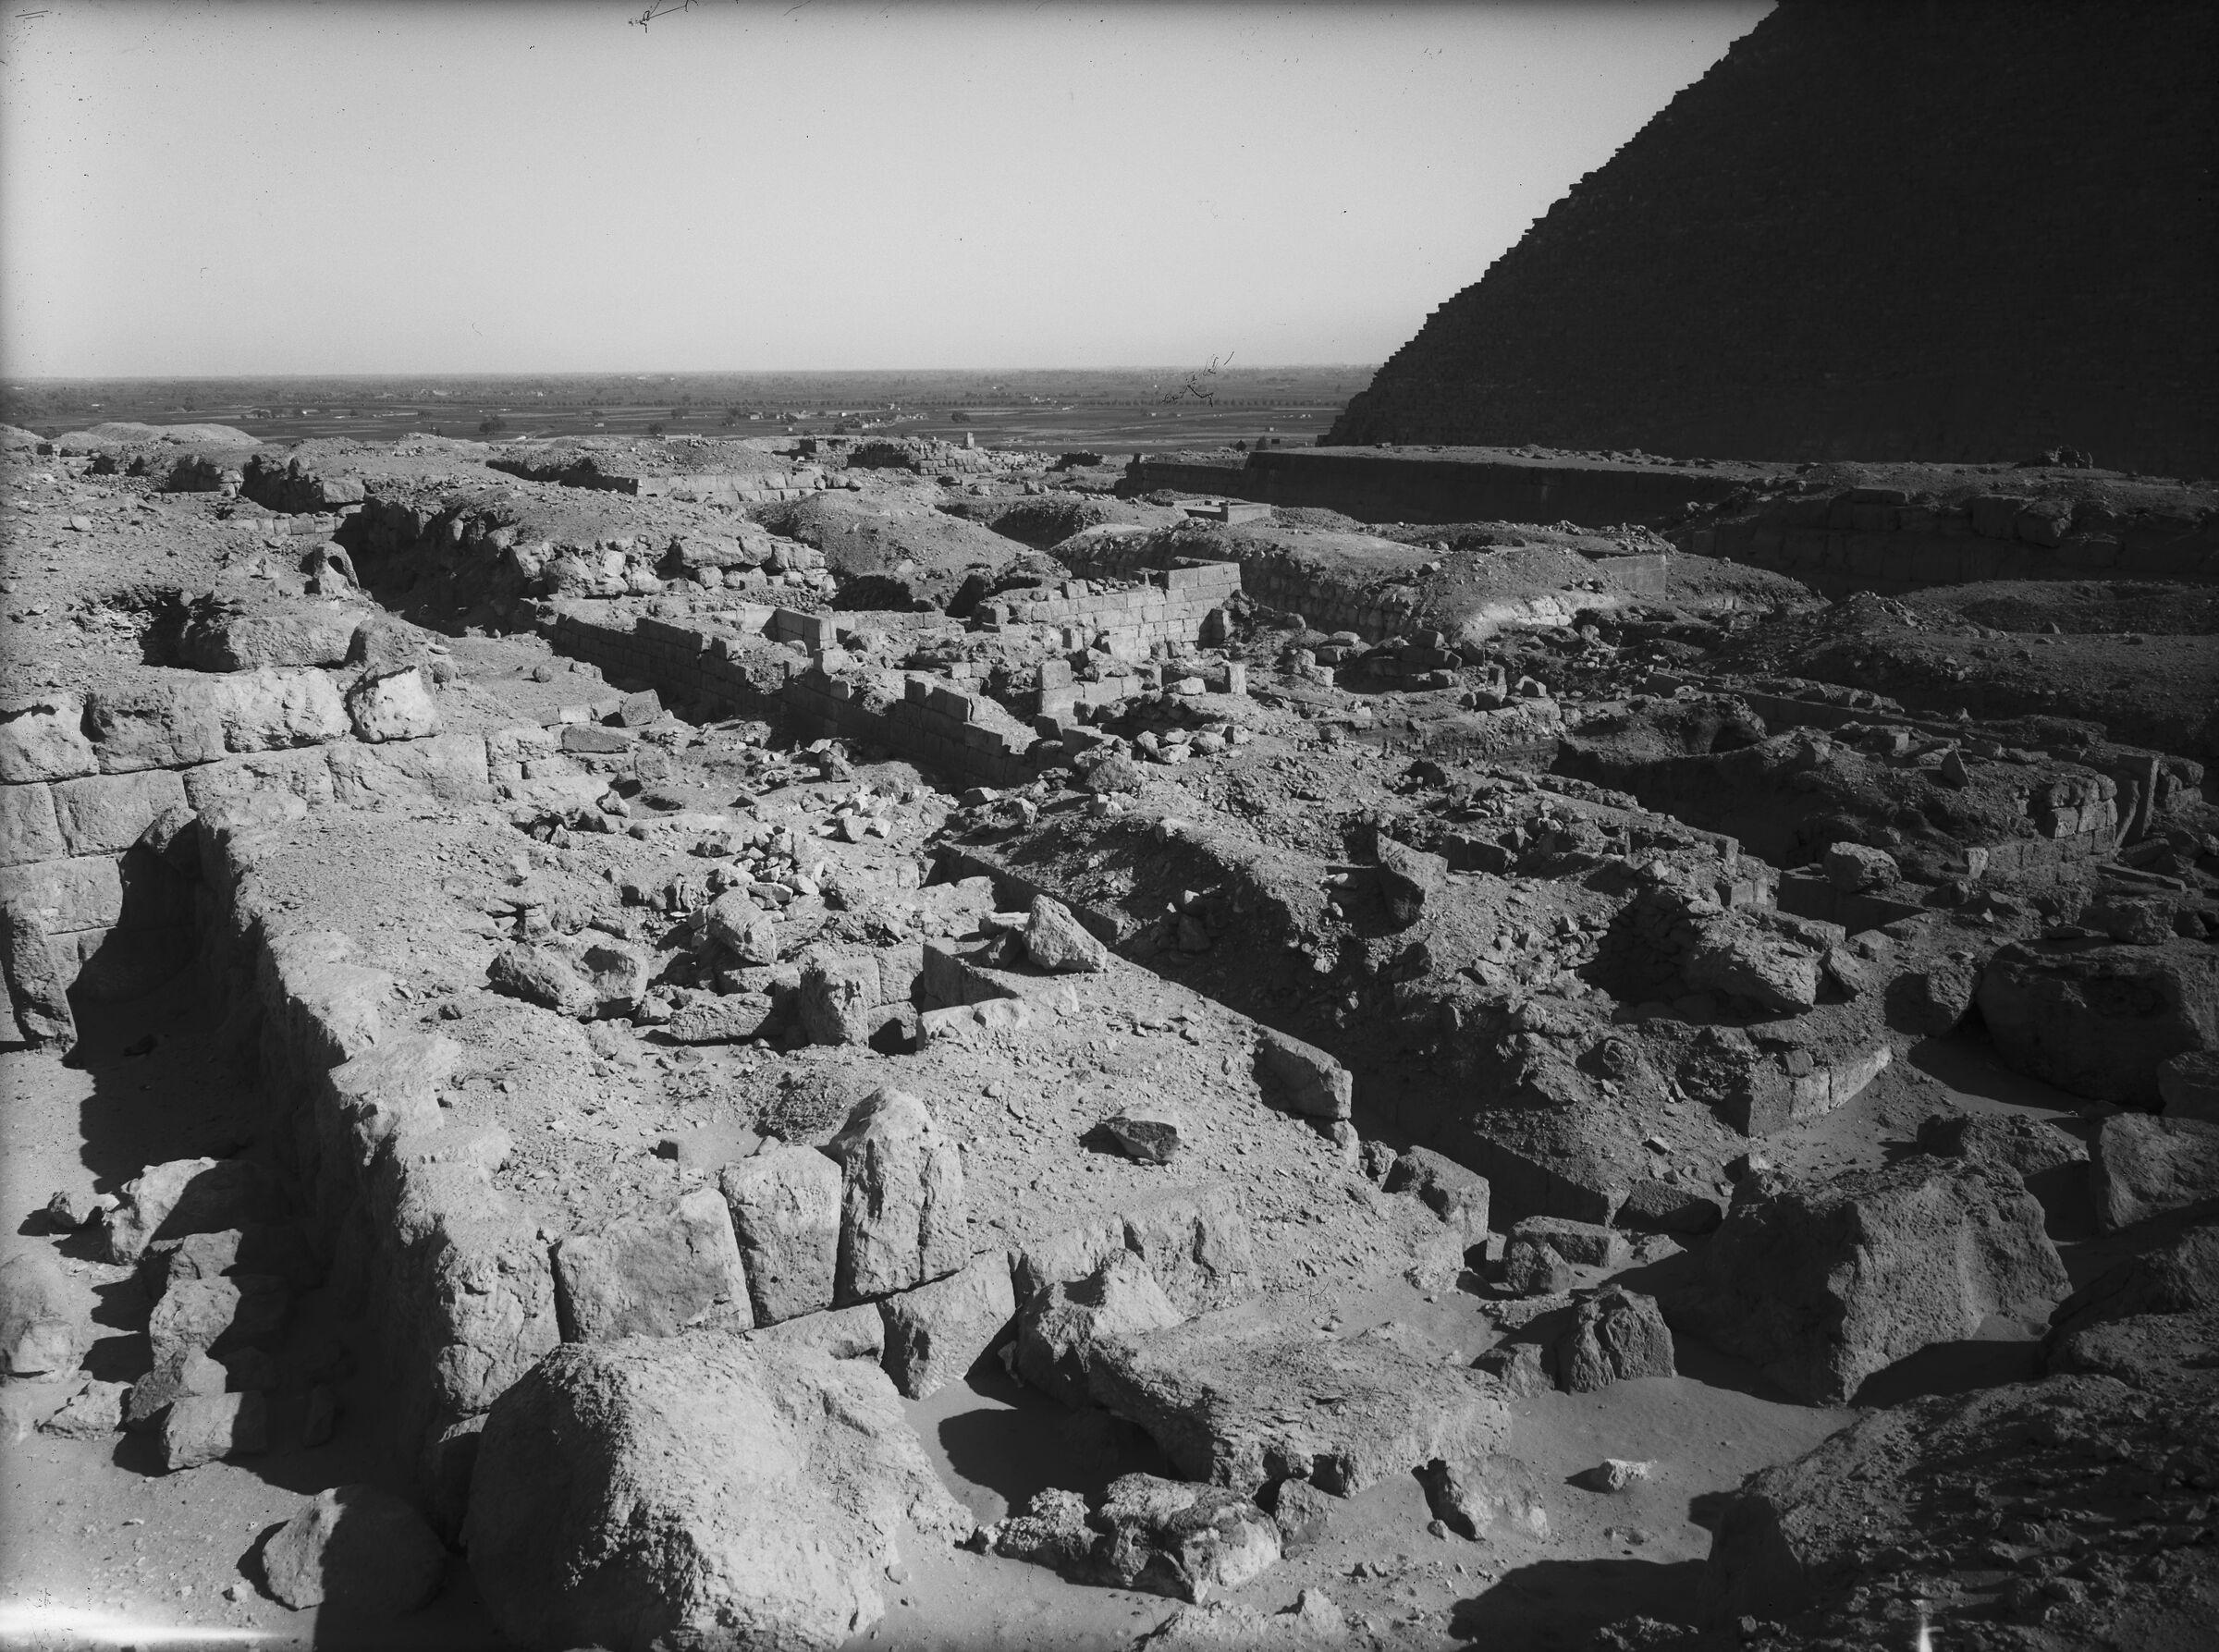 Western Cemetery: Site: Giza; View: G 4710, G 4712, G 4714, G 4810, G 4811+4812, G 4813